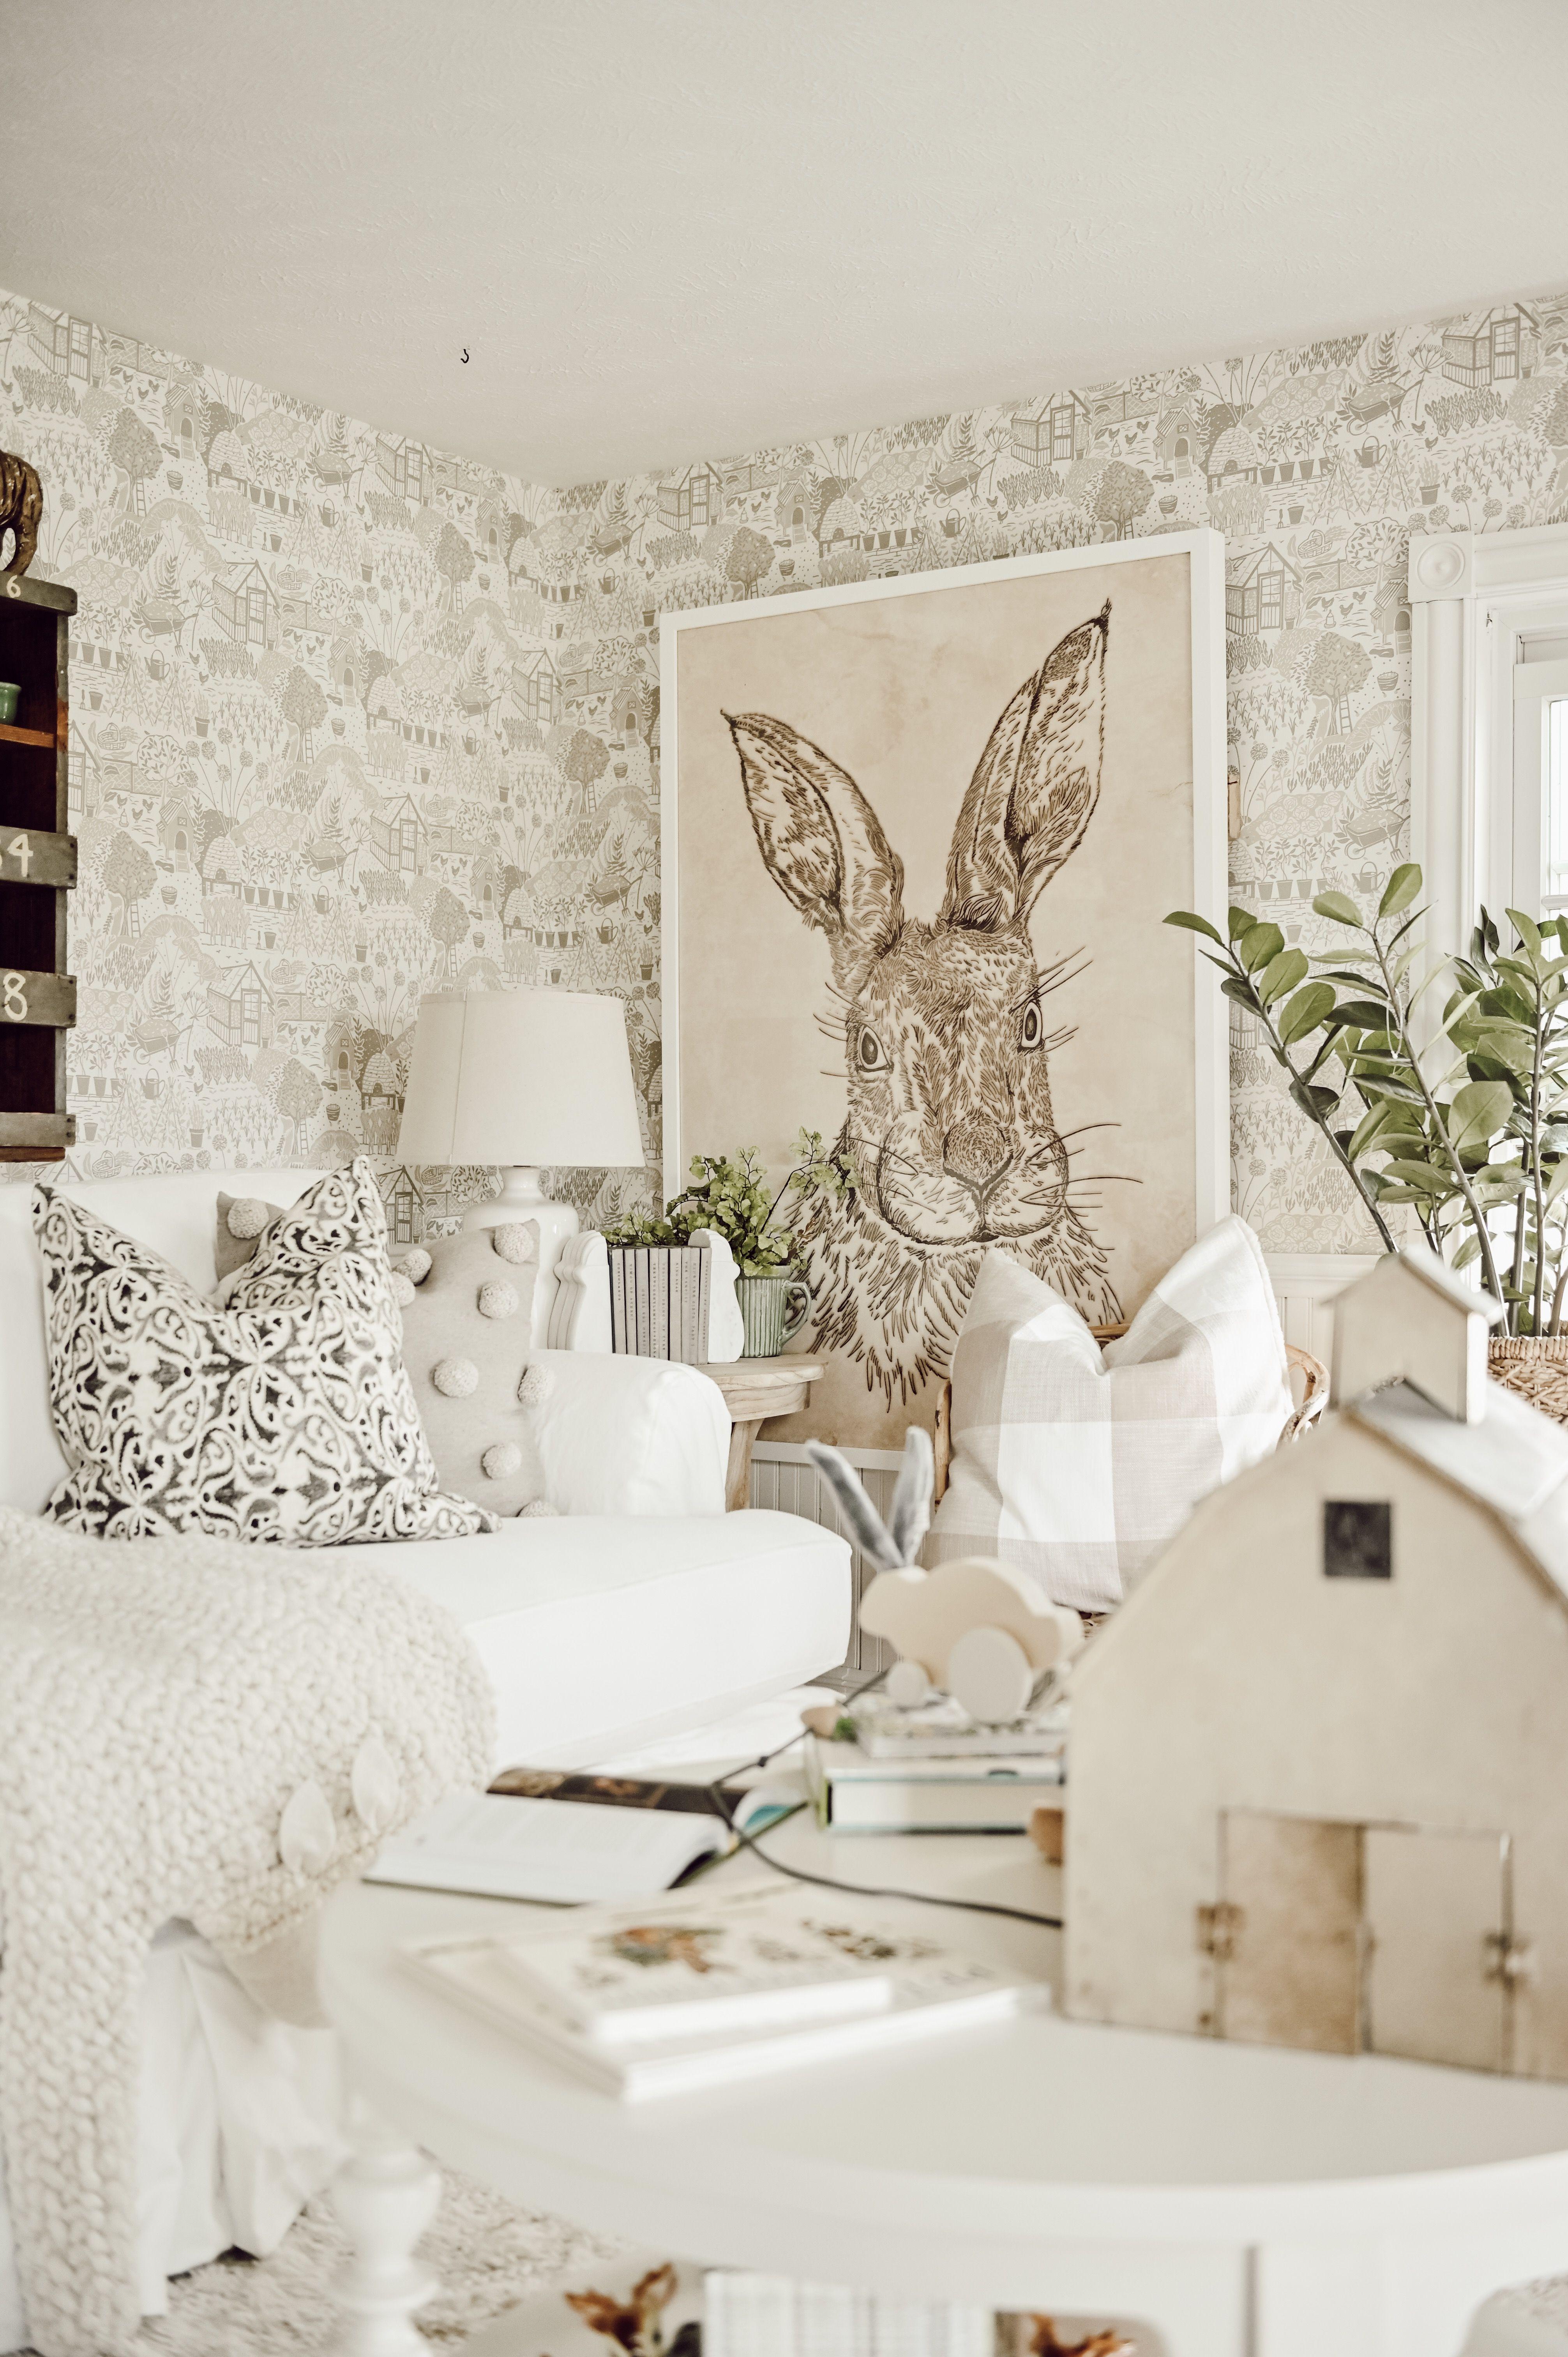 A Timeless Playroom Home Decor Decor Bedroom Design Playroom progress curtains pillow